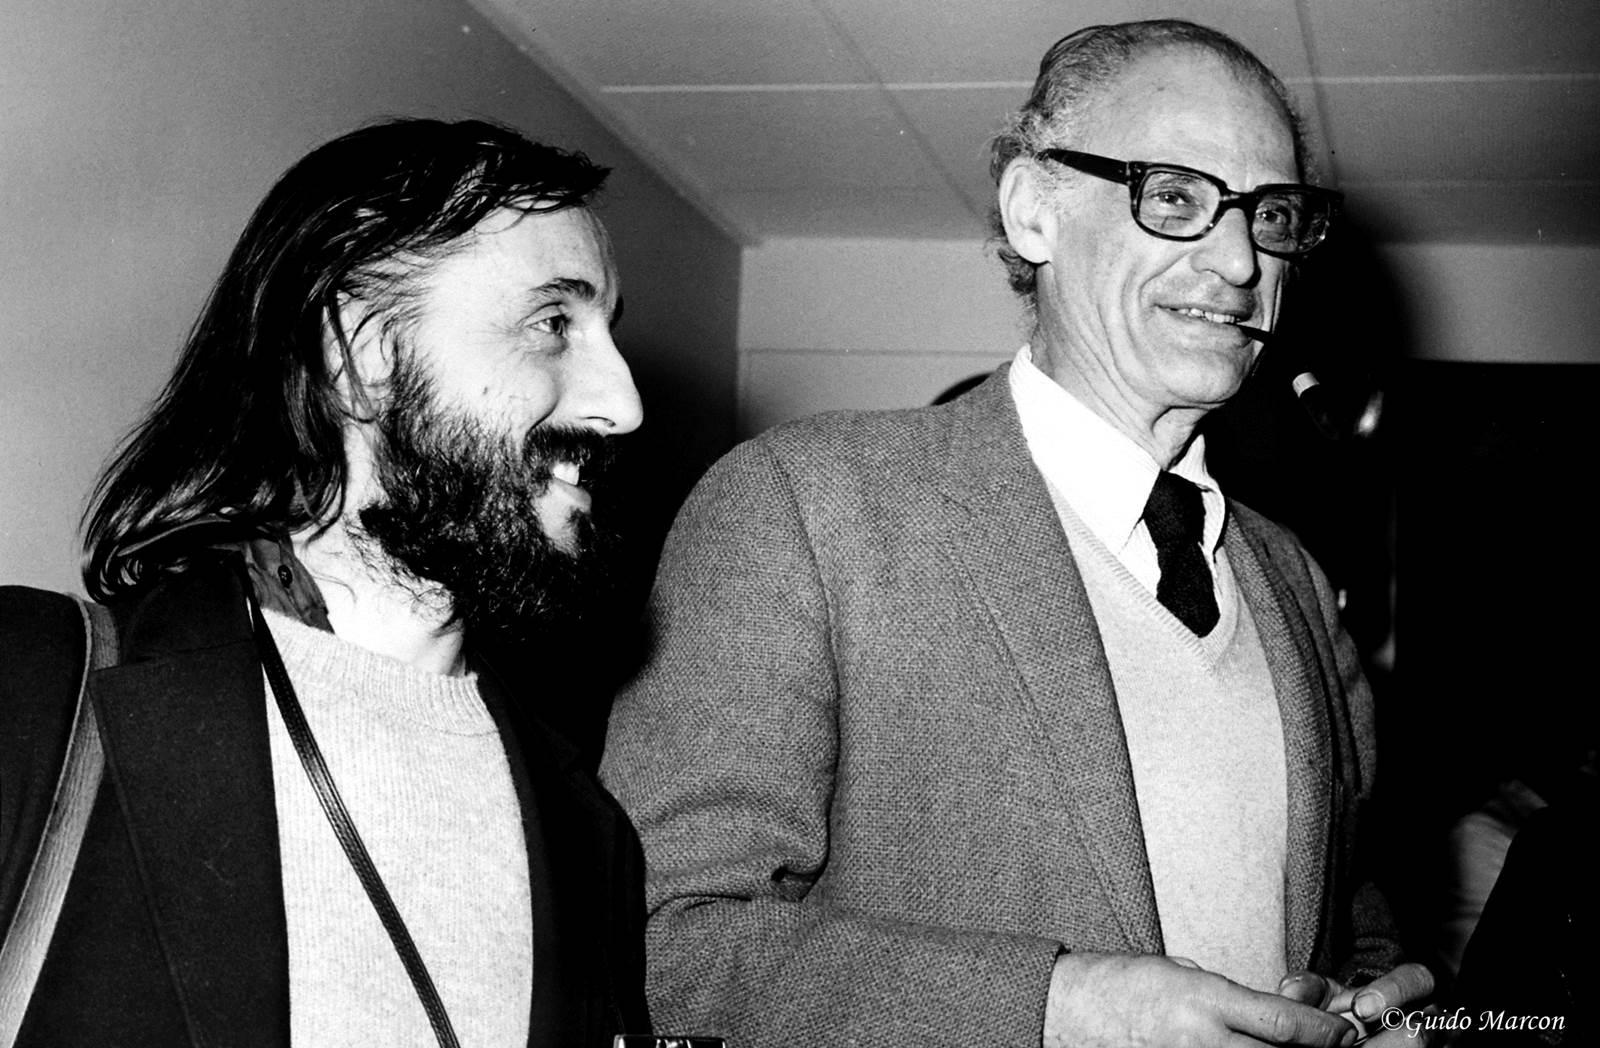 Guido Marcon et Arthur Miller